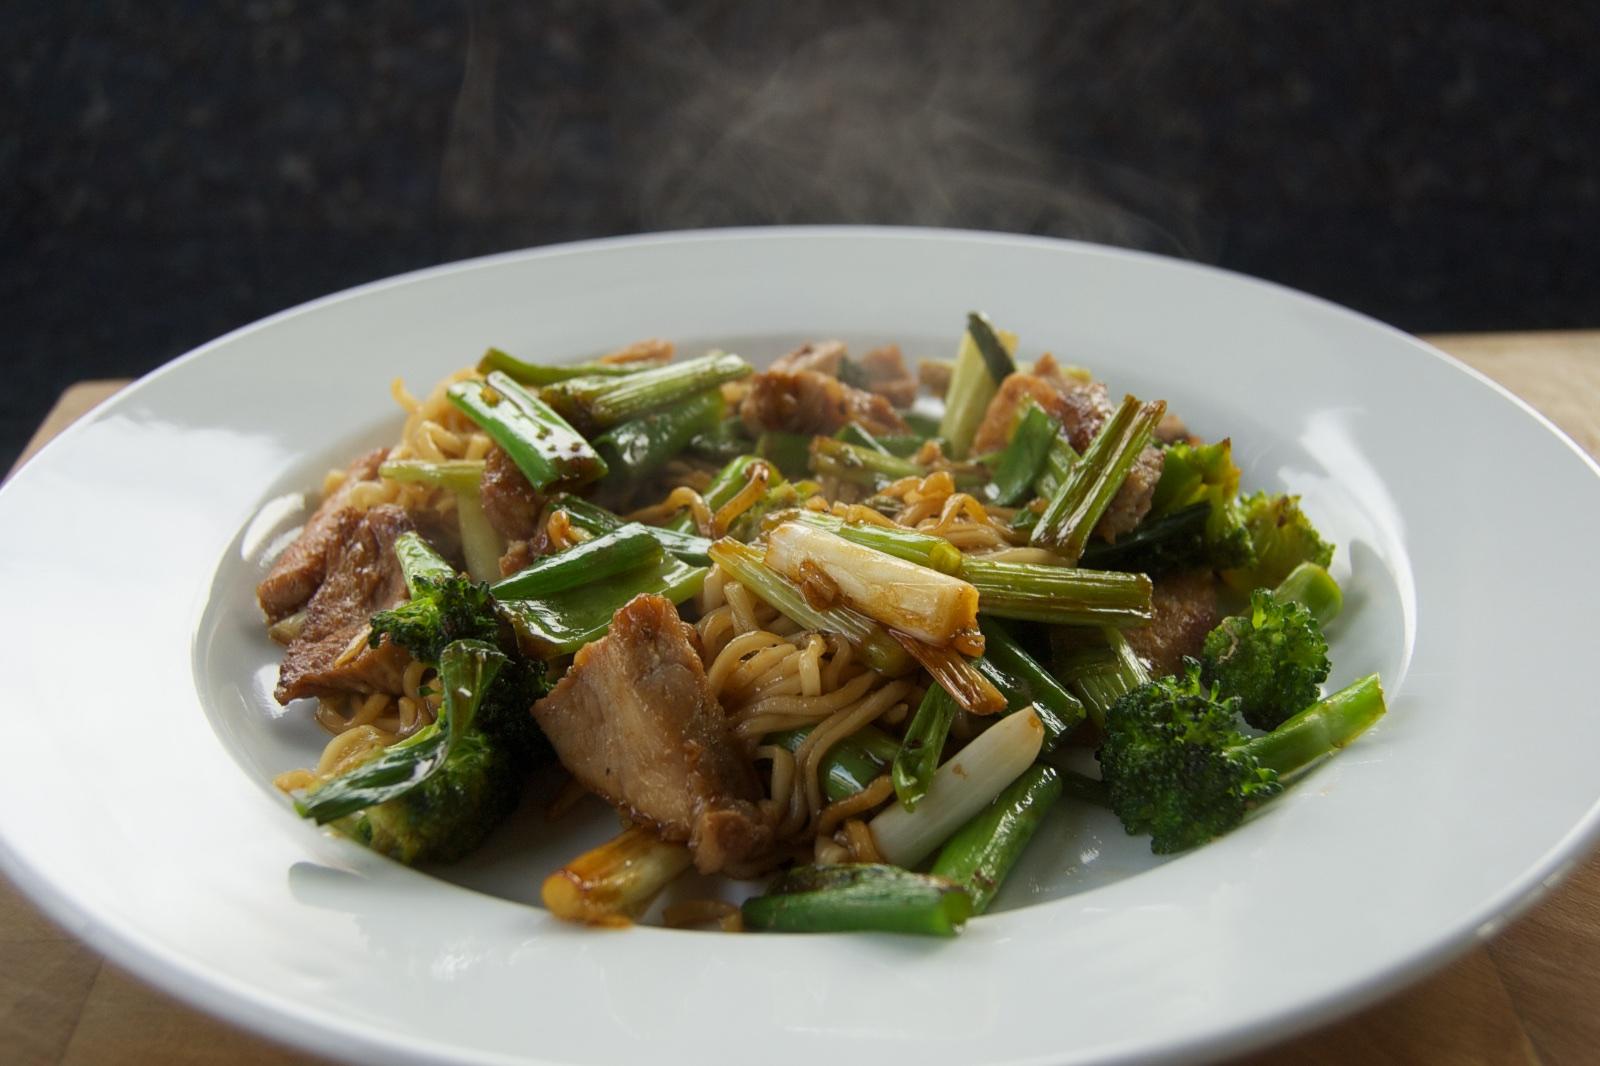 http://blog.rickk.com/food/2014/11/09/ate.2014.11.09.l.jpg